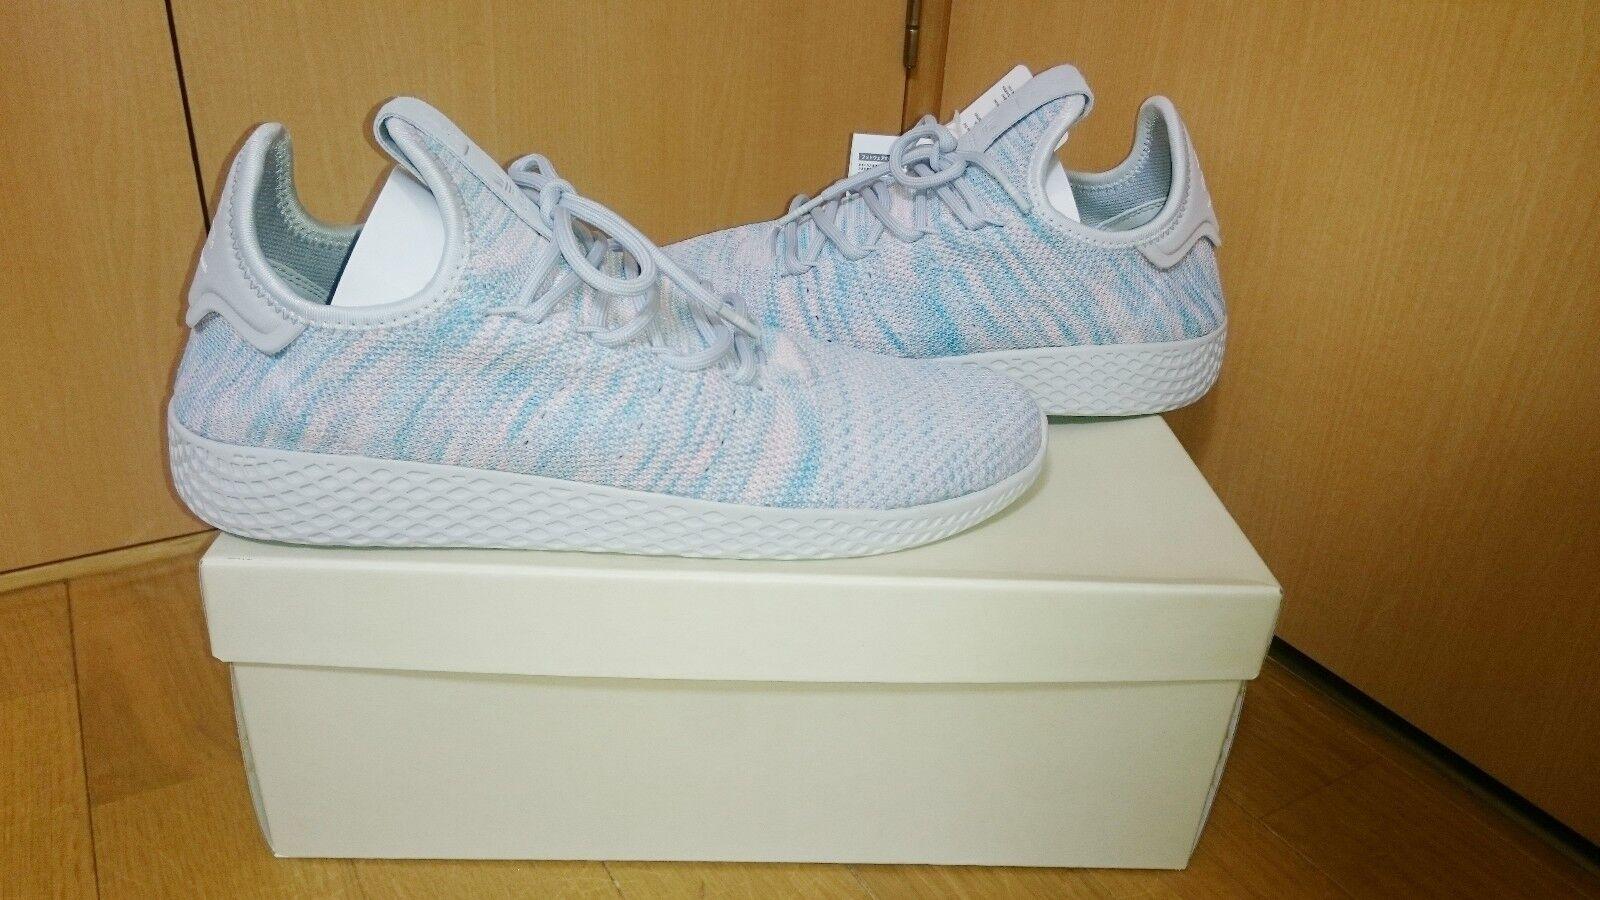 10 PW adidas X PHARRELL WILLIAMS PW 10 TENNIS HU LIGHT BLUE 8df279